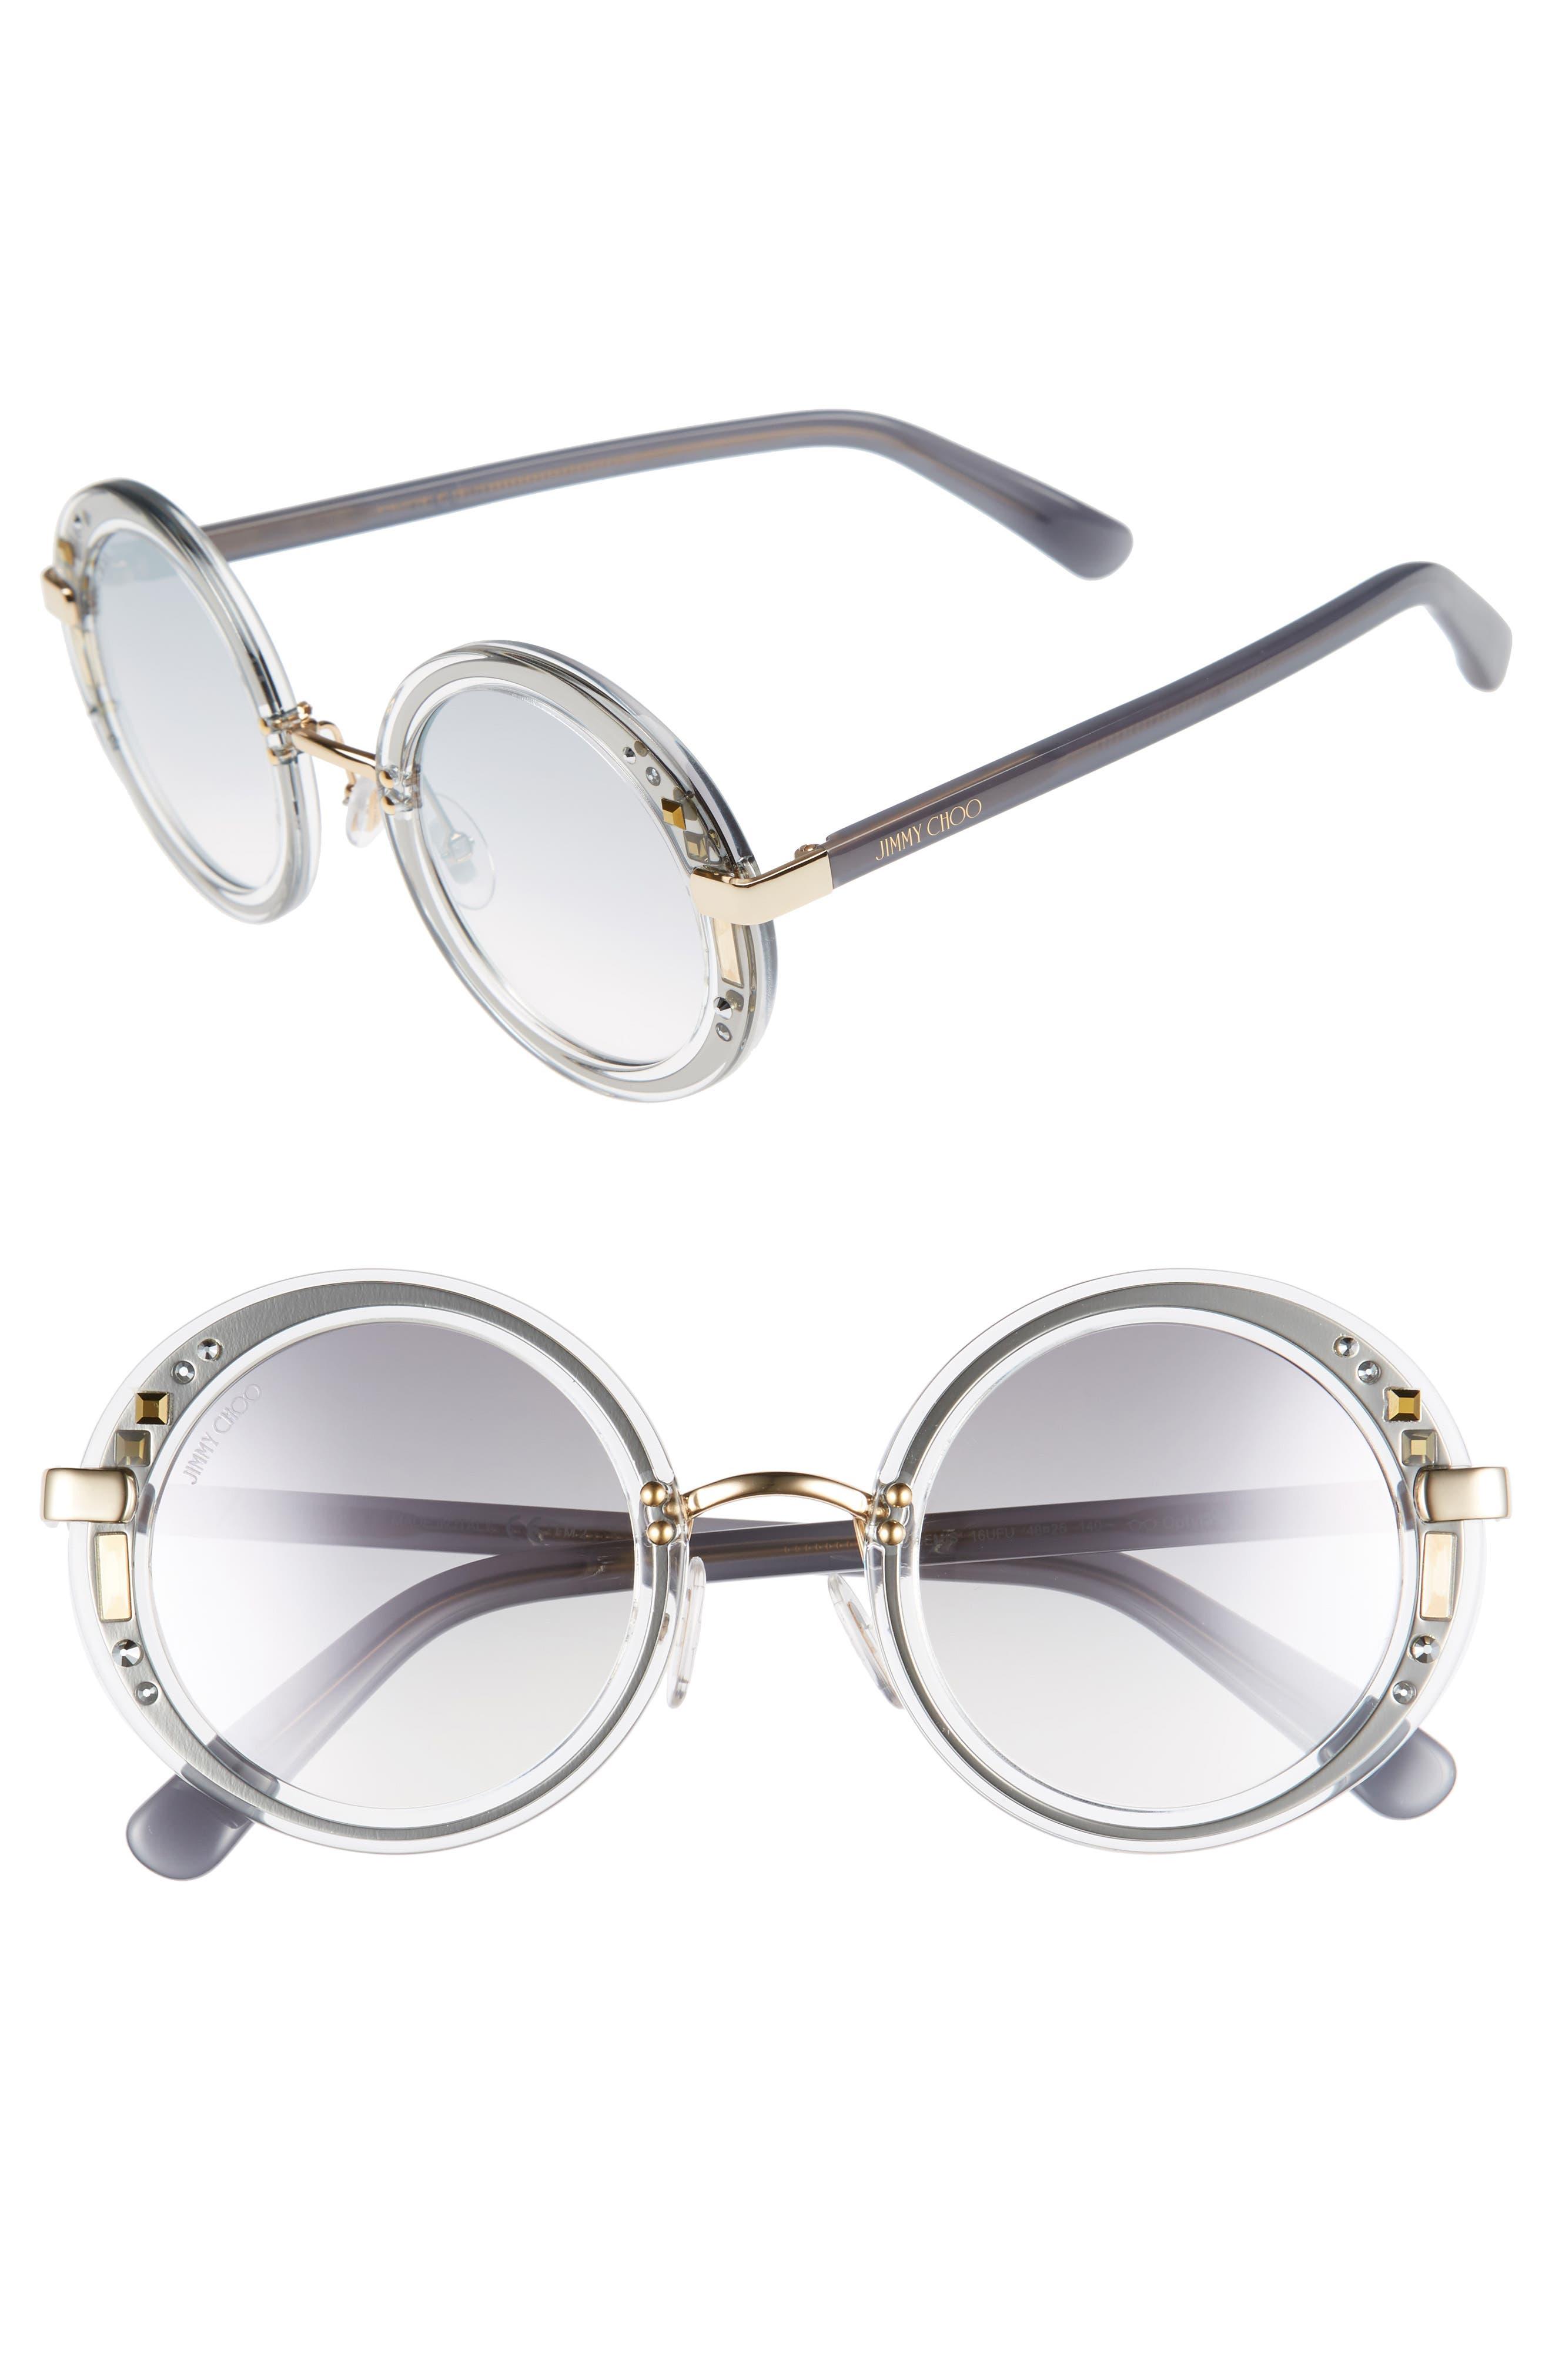 Main Image - Jimmy Choo Gems 48mm Round Sunglasses